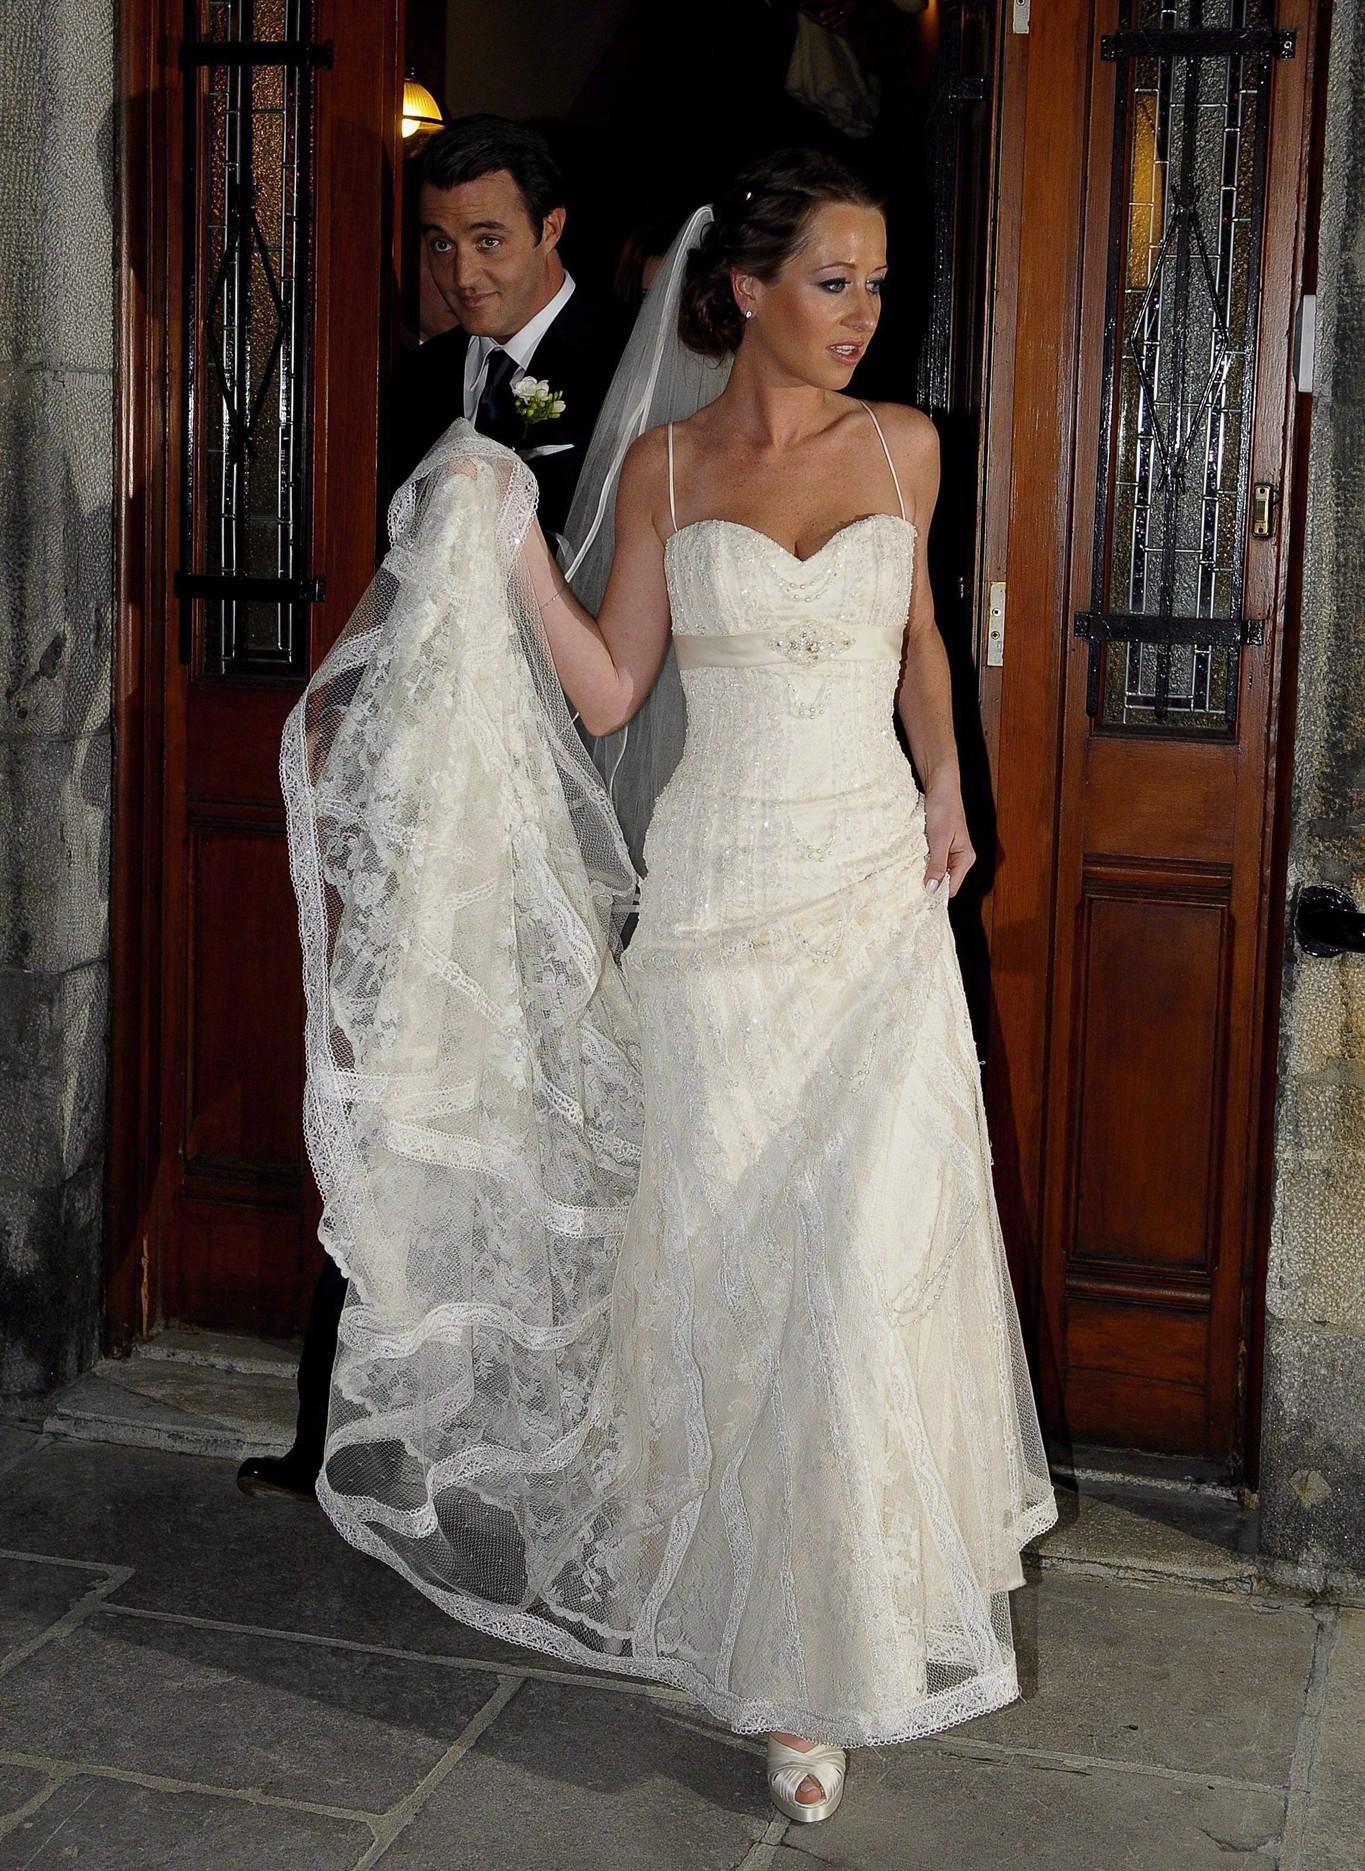 Patrick Ahearn Mulroney Children To Act As Bridesmaid Page Boys At Royal